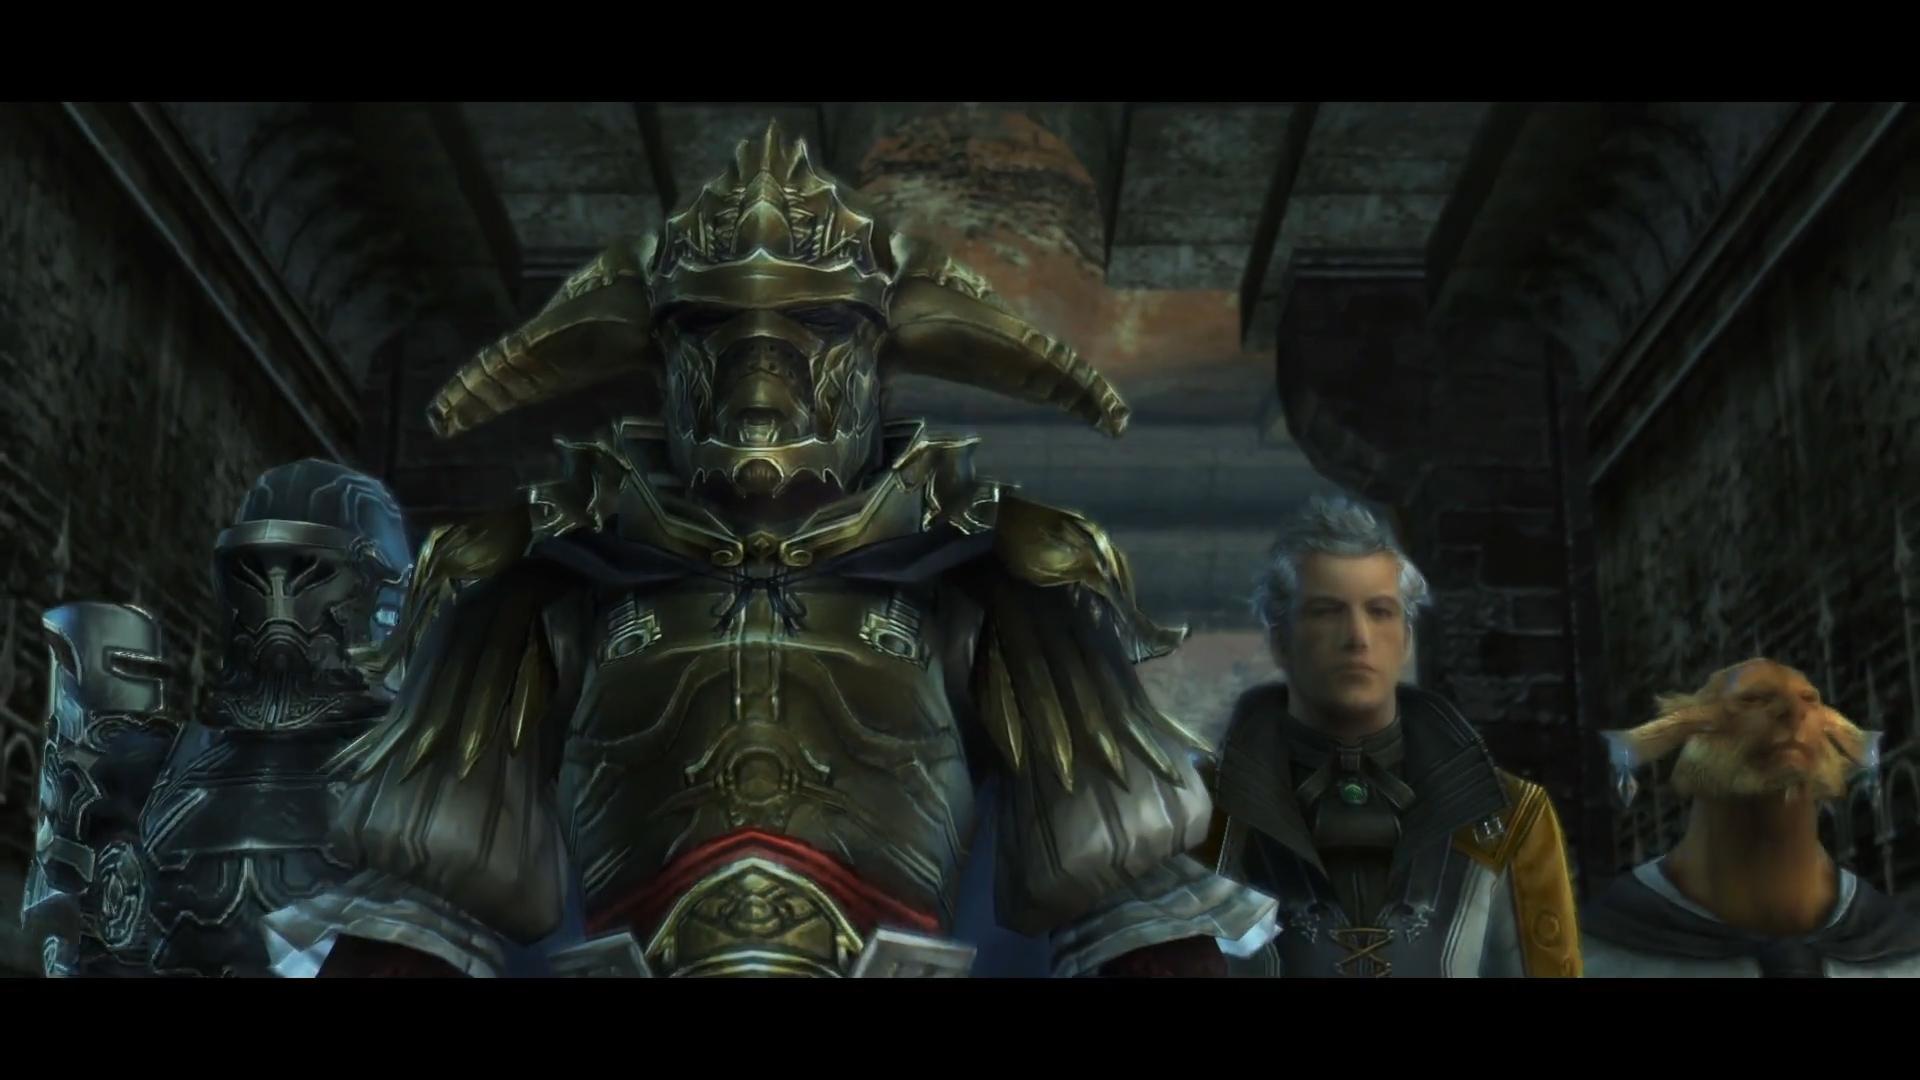 Final-Fantasy-XII-The-Zodiac-Age-Boss.jpg